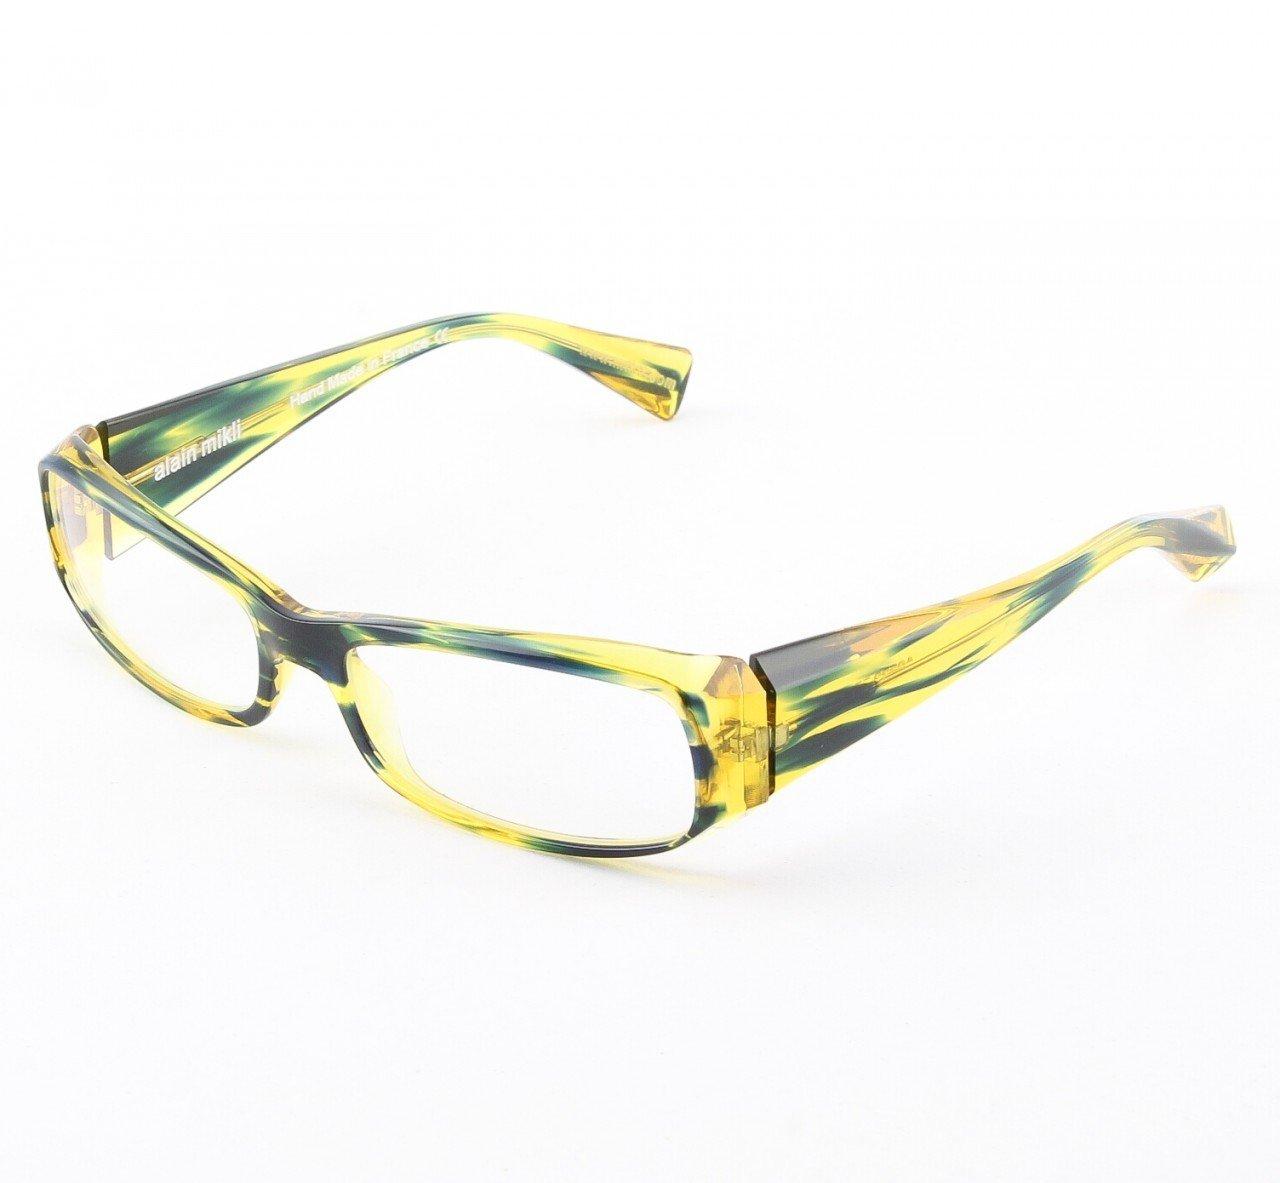 Alain Mikli Eyeglasses AL0322 Col. 55 Black and Yellow Translucent